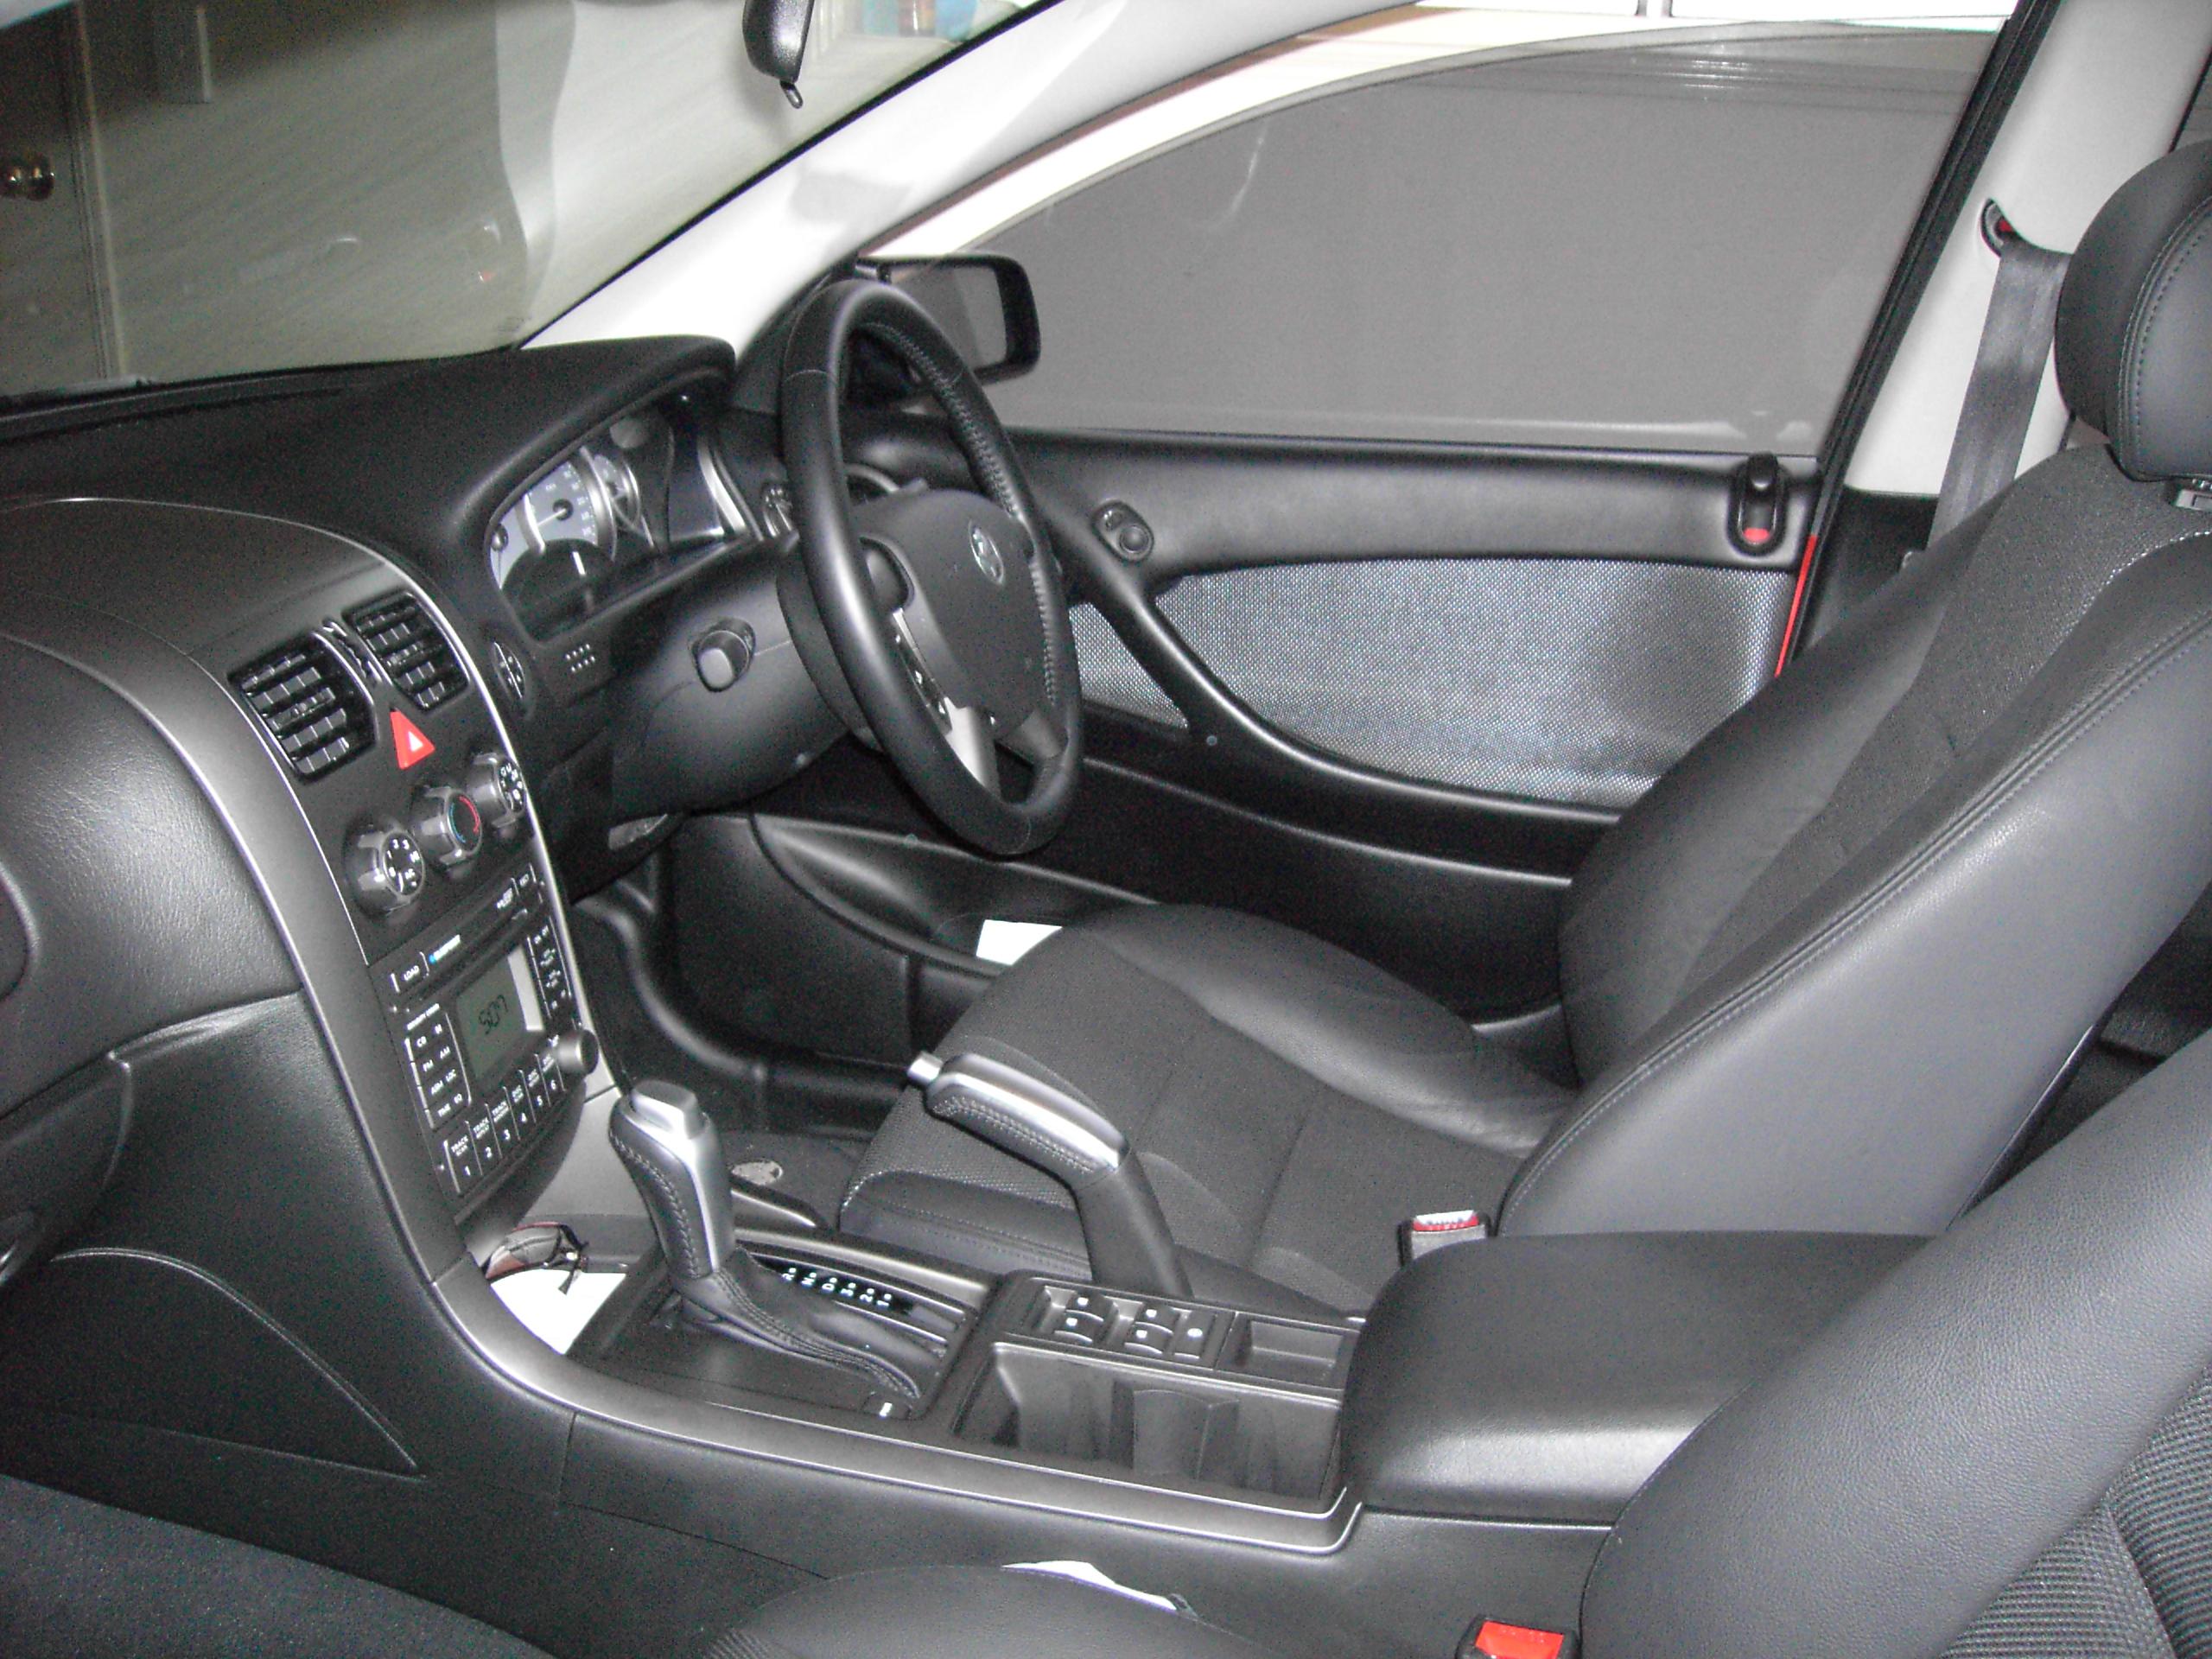 File:Interior of a 2006 Holden VZ Commodore SVZ 01.jpg